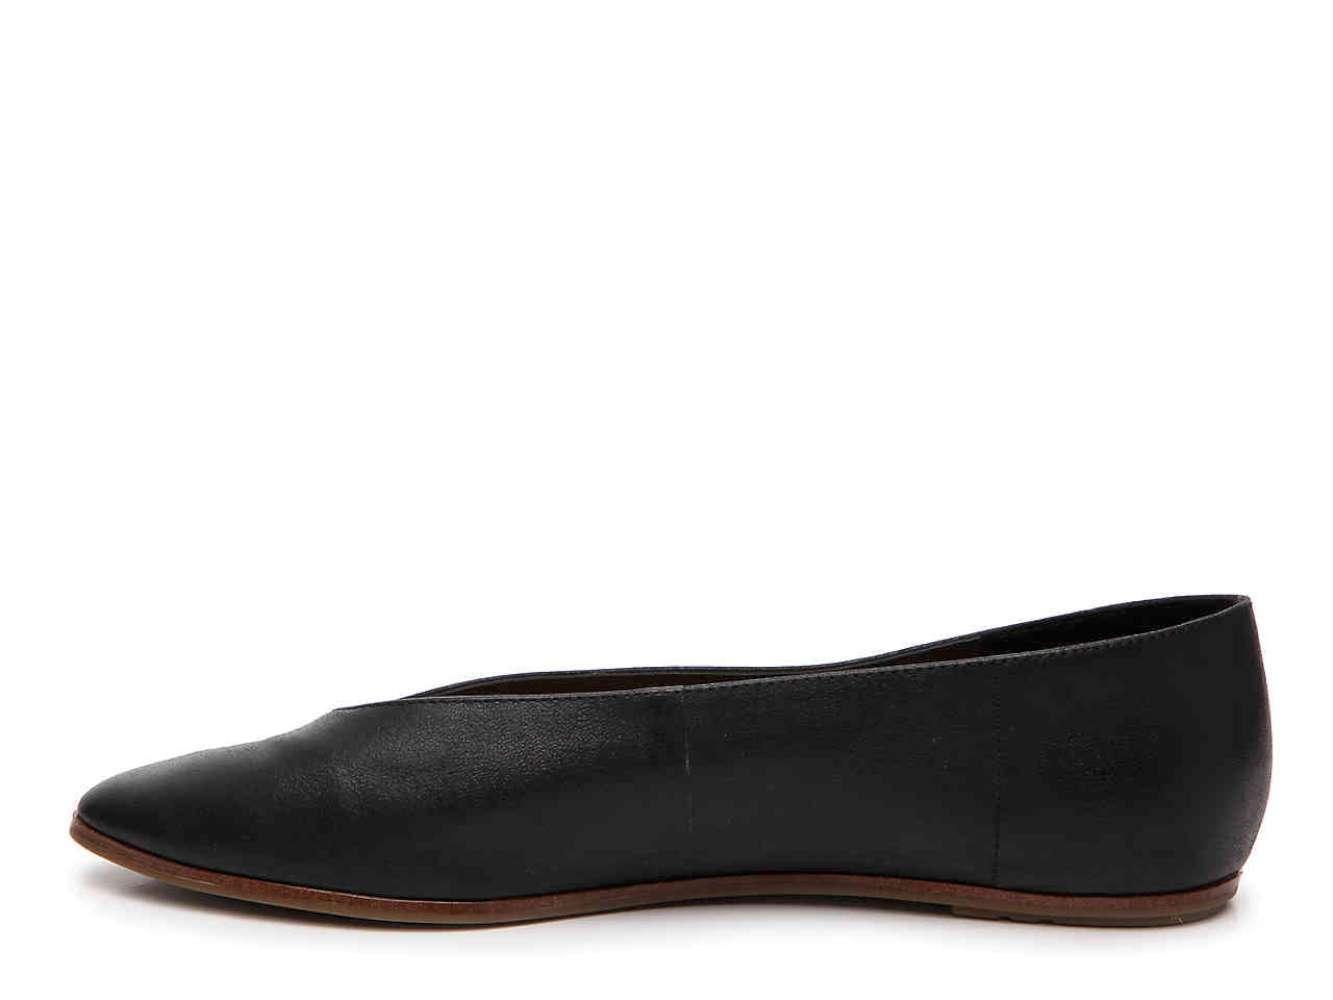 Crown Vintage Womens Telian Black Leather Closed Toe Loafers  Black Telian  Size 9.5 mqVK 88c60e